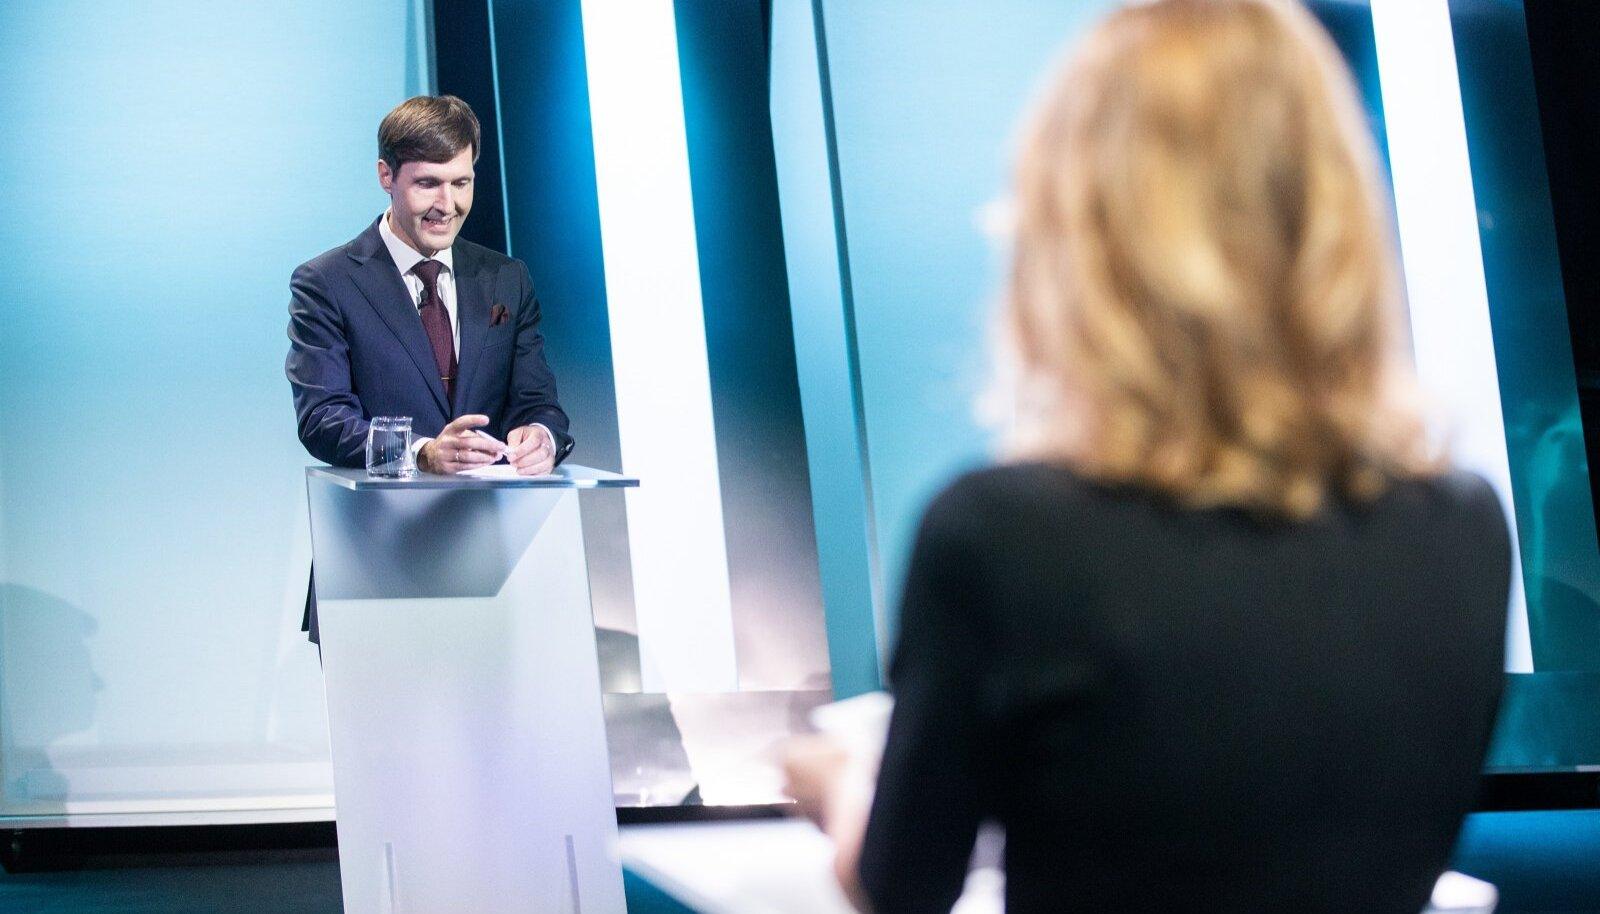 29.08.2021  Erakondade esindajate debatt